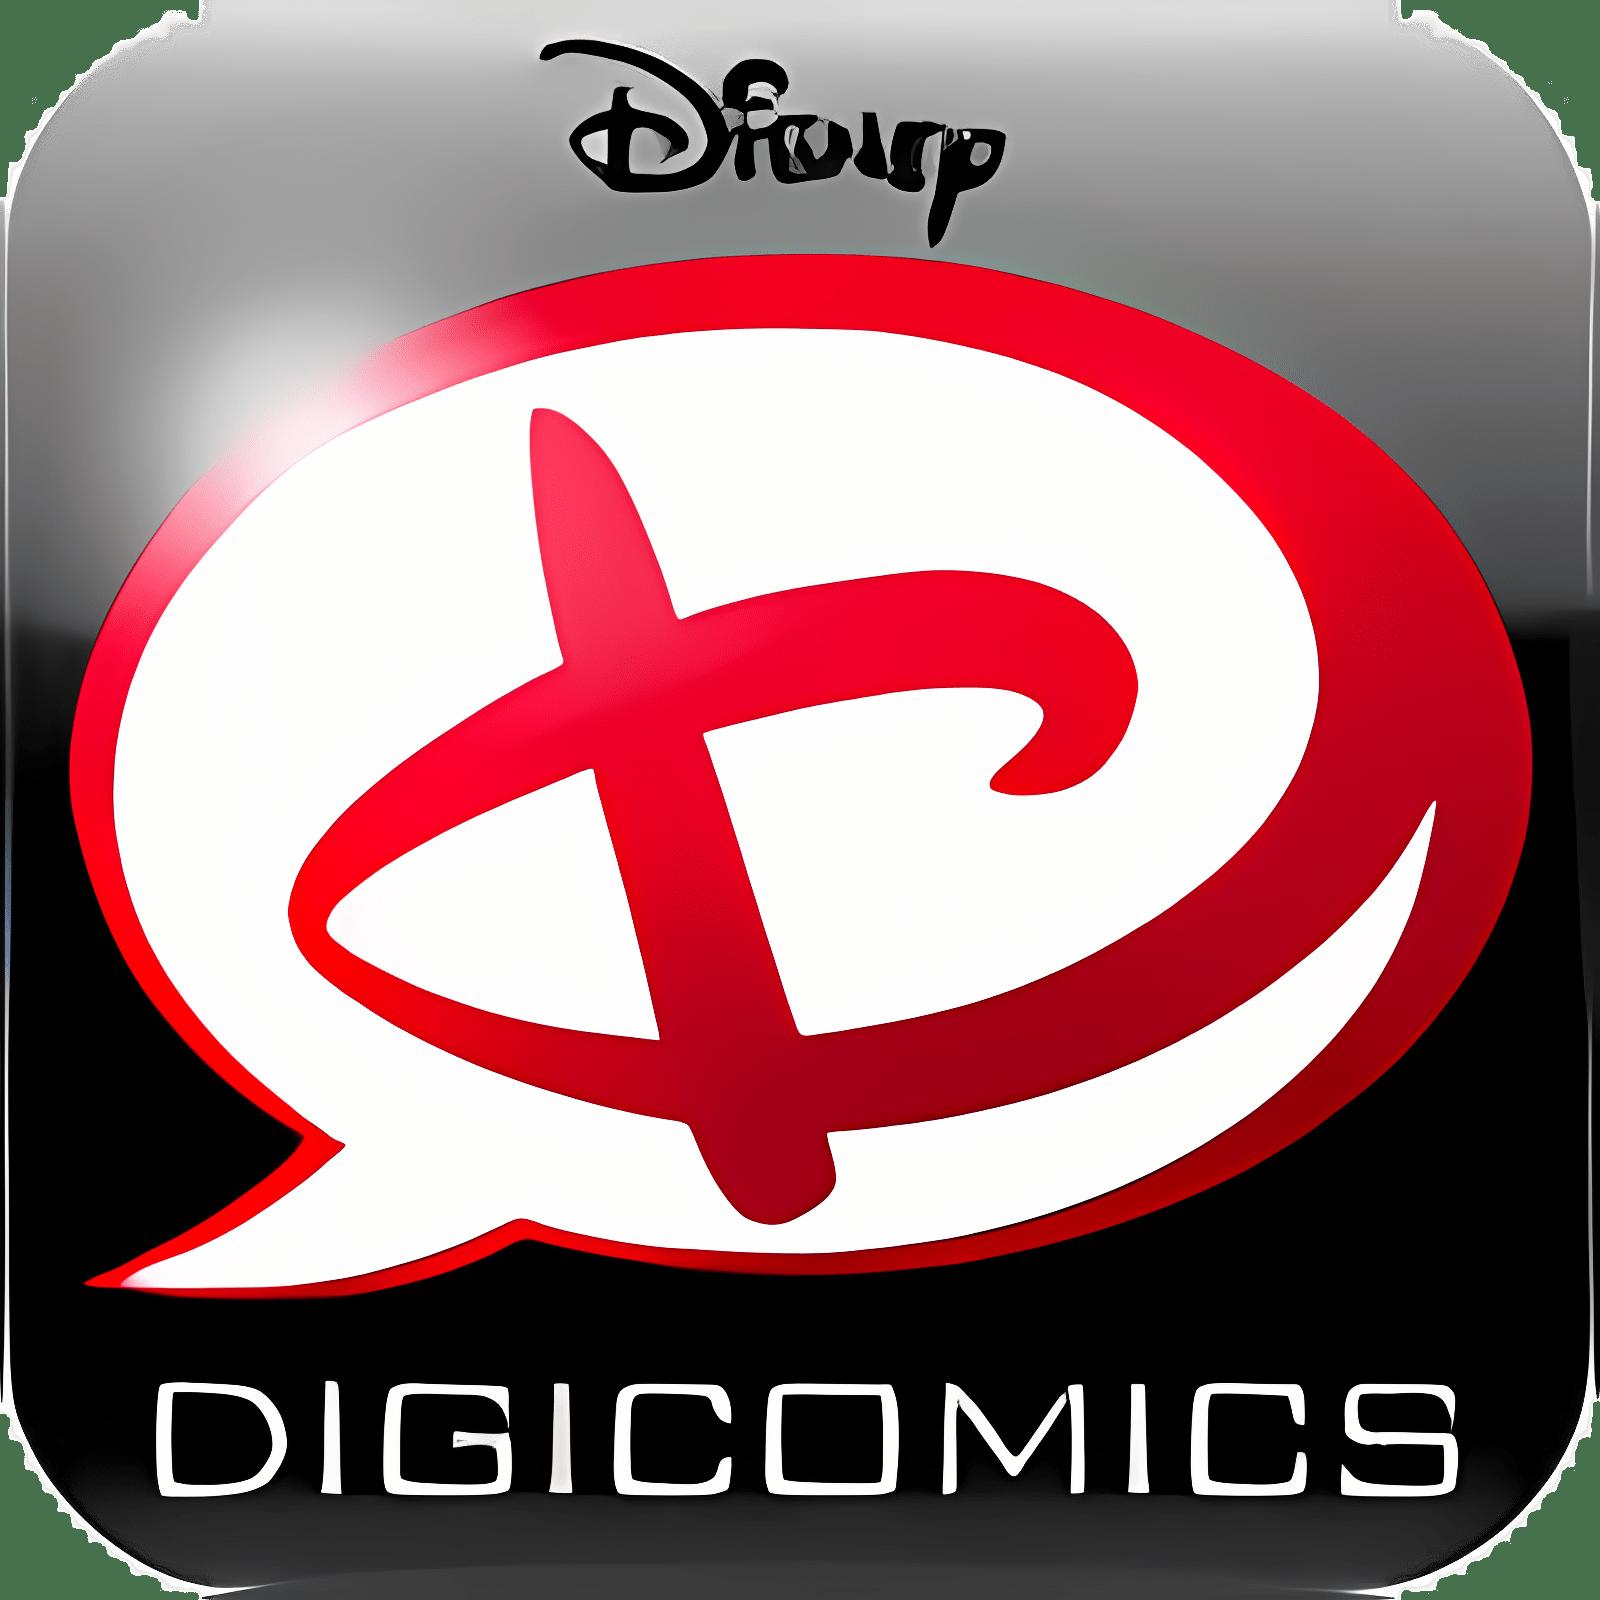 Disney Digicomics